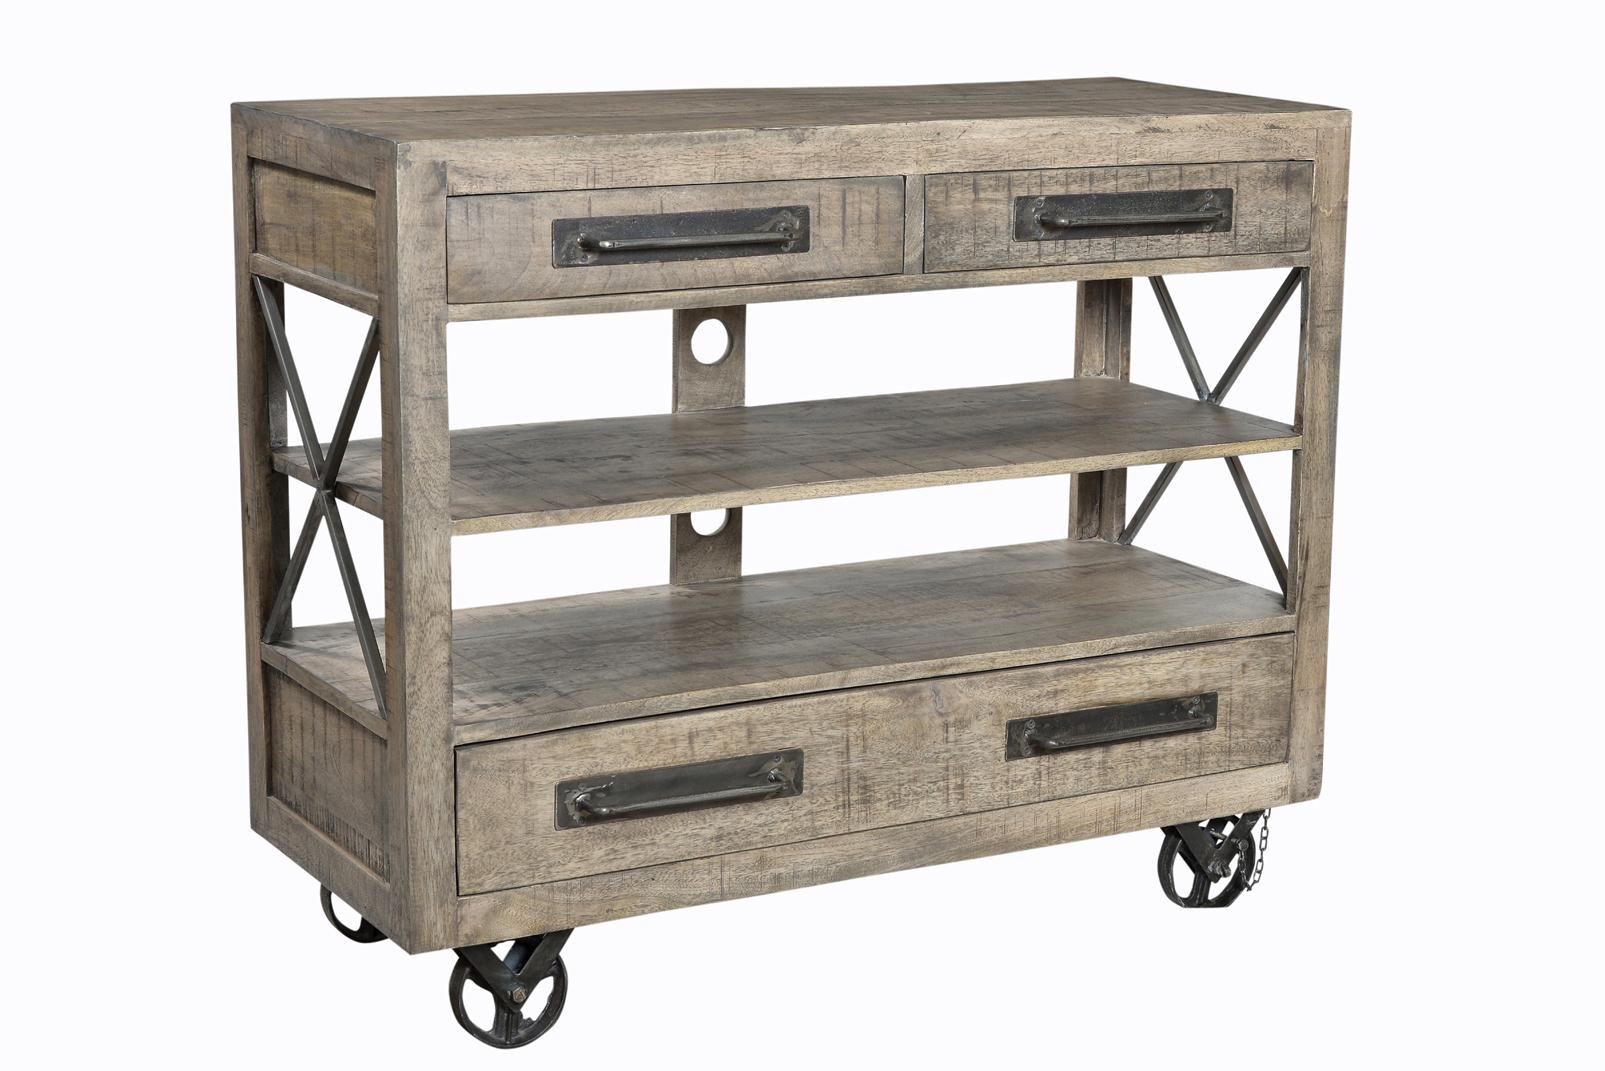 desserte roulettes de style industriel en metal. Black Bedroom Furniture Sets. Home Design Ideas